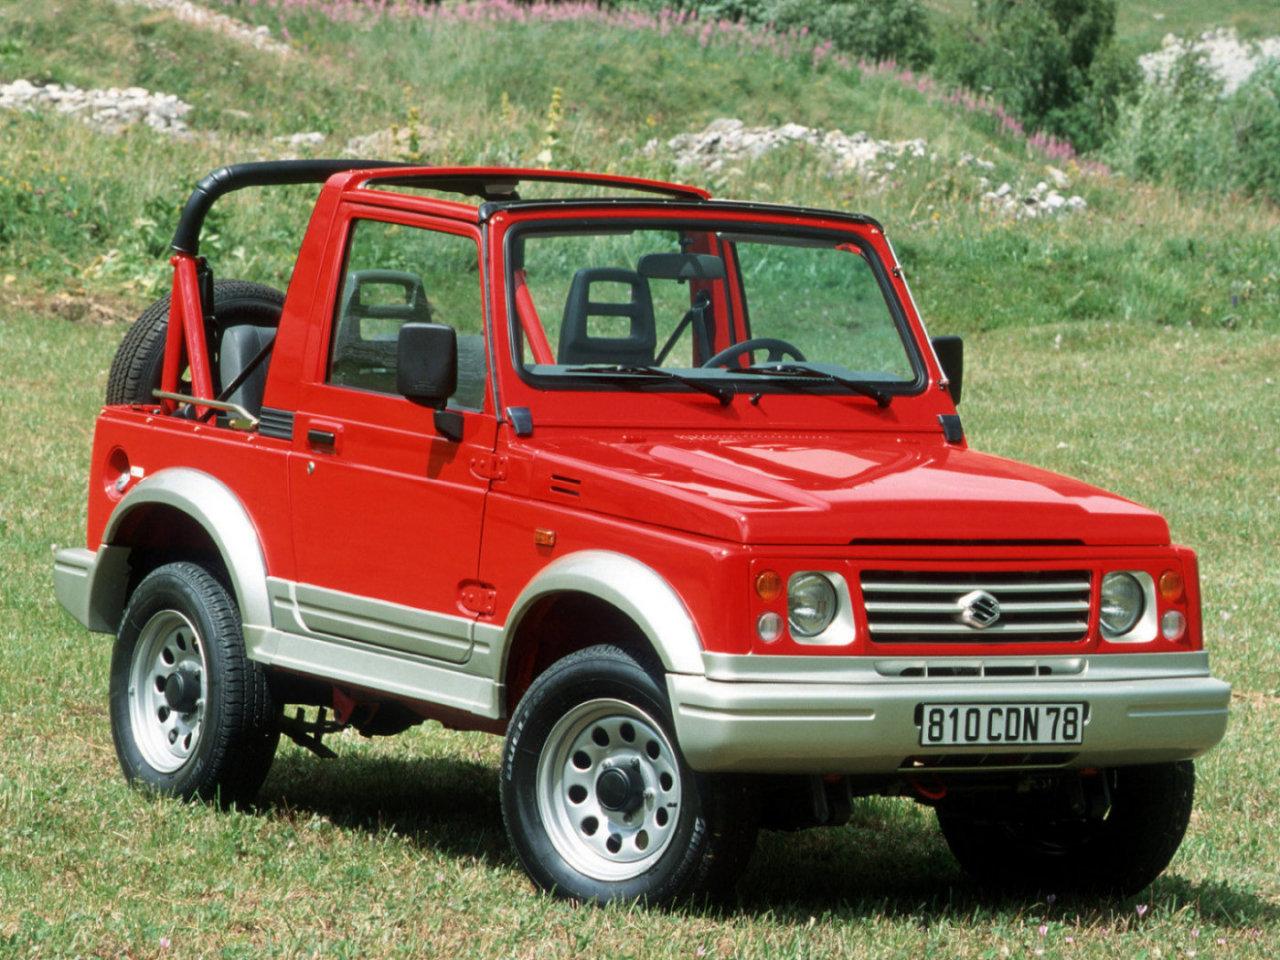 http://4.bp.blogspot.com/-maVmmro2P_8/TnobhptuBNI/AAAAAAAACZY/0dSOyCE-zL8/s1600/Suzuki+Samurai+Jeep+Cars+Wallpapers+4.jpg